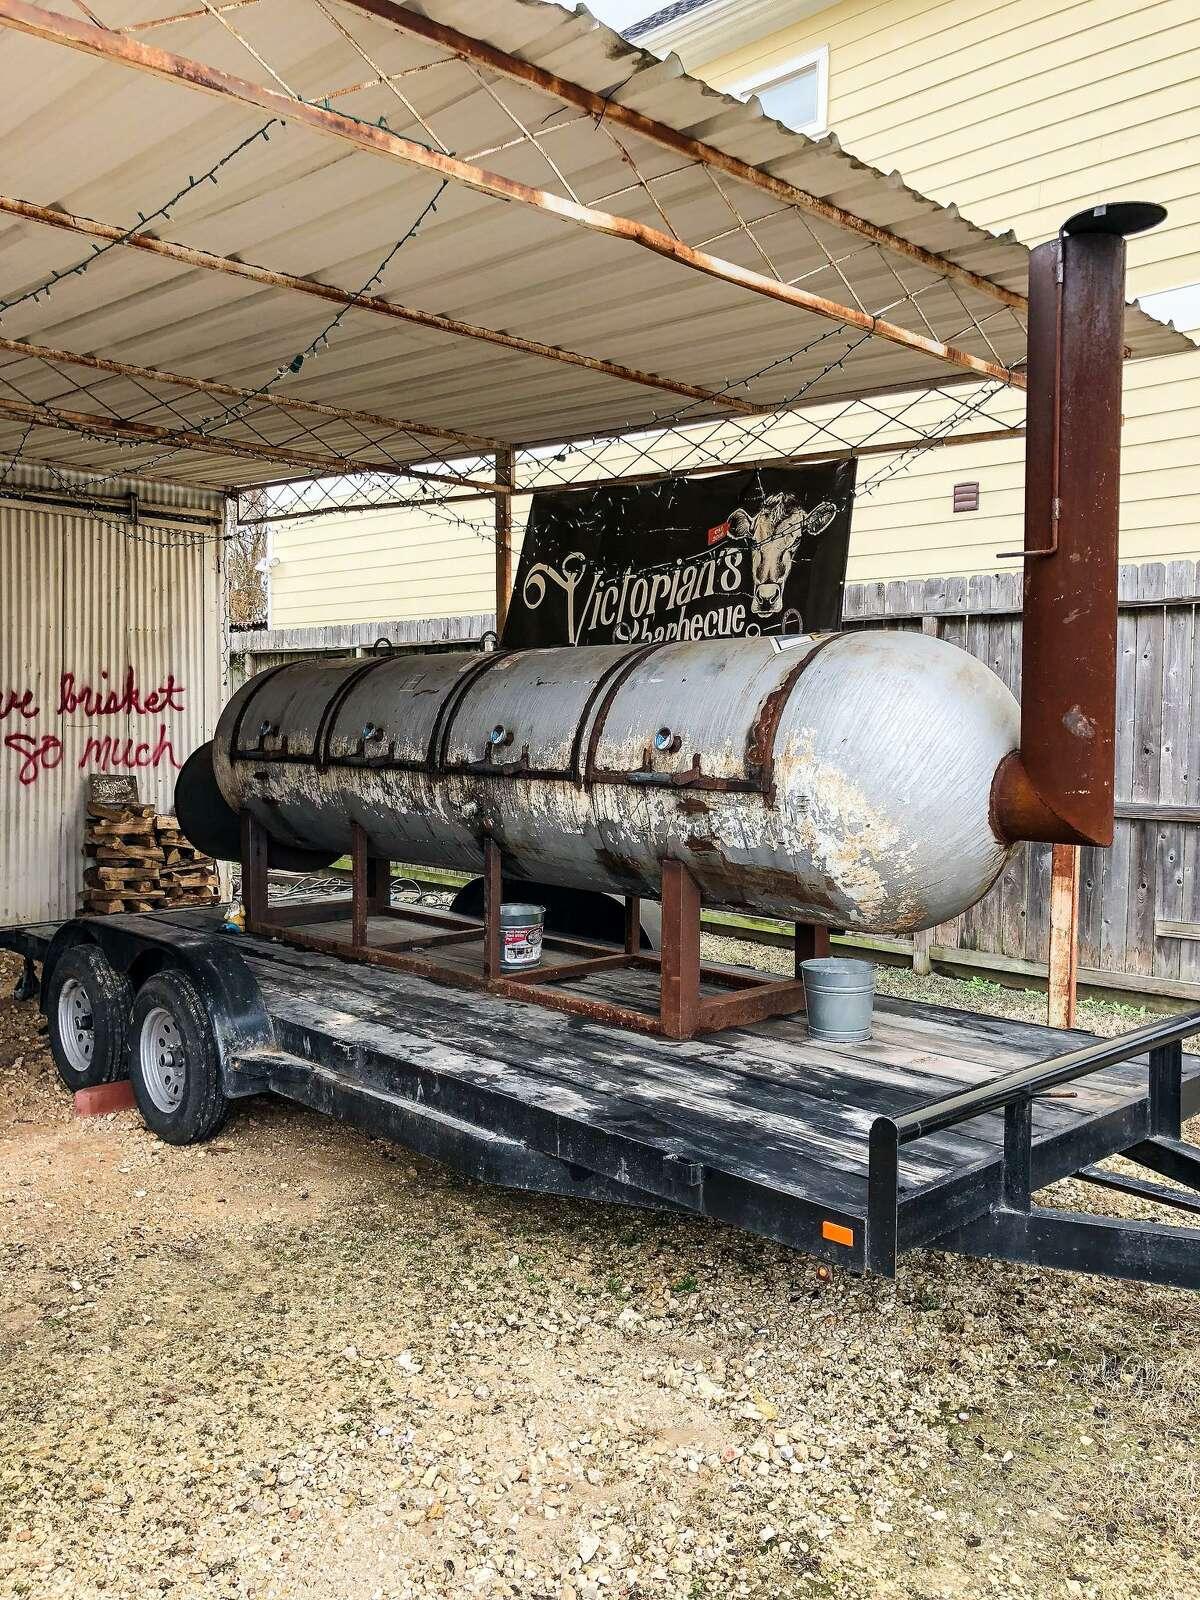 A 1000-gallon, trailer-mounted smoker at Victorian's Barbecue.